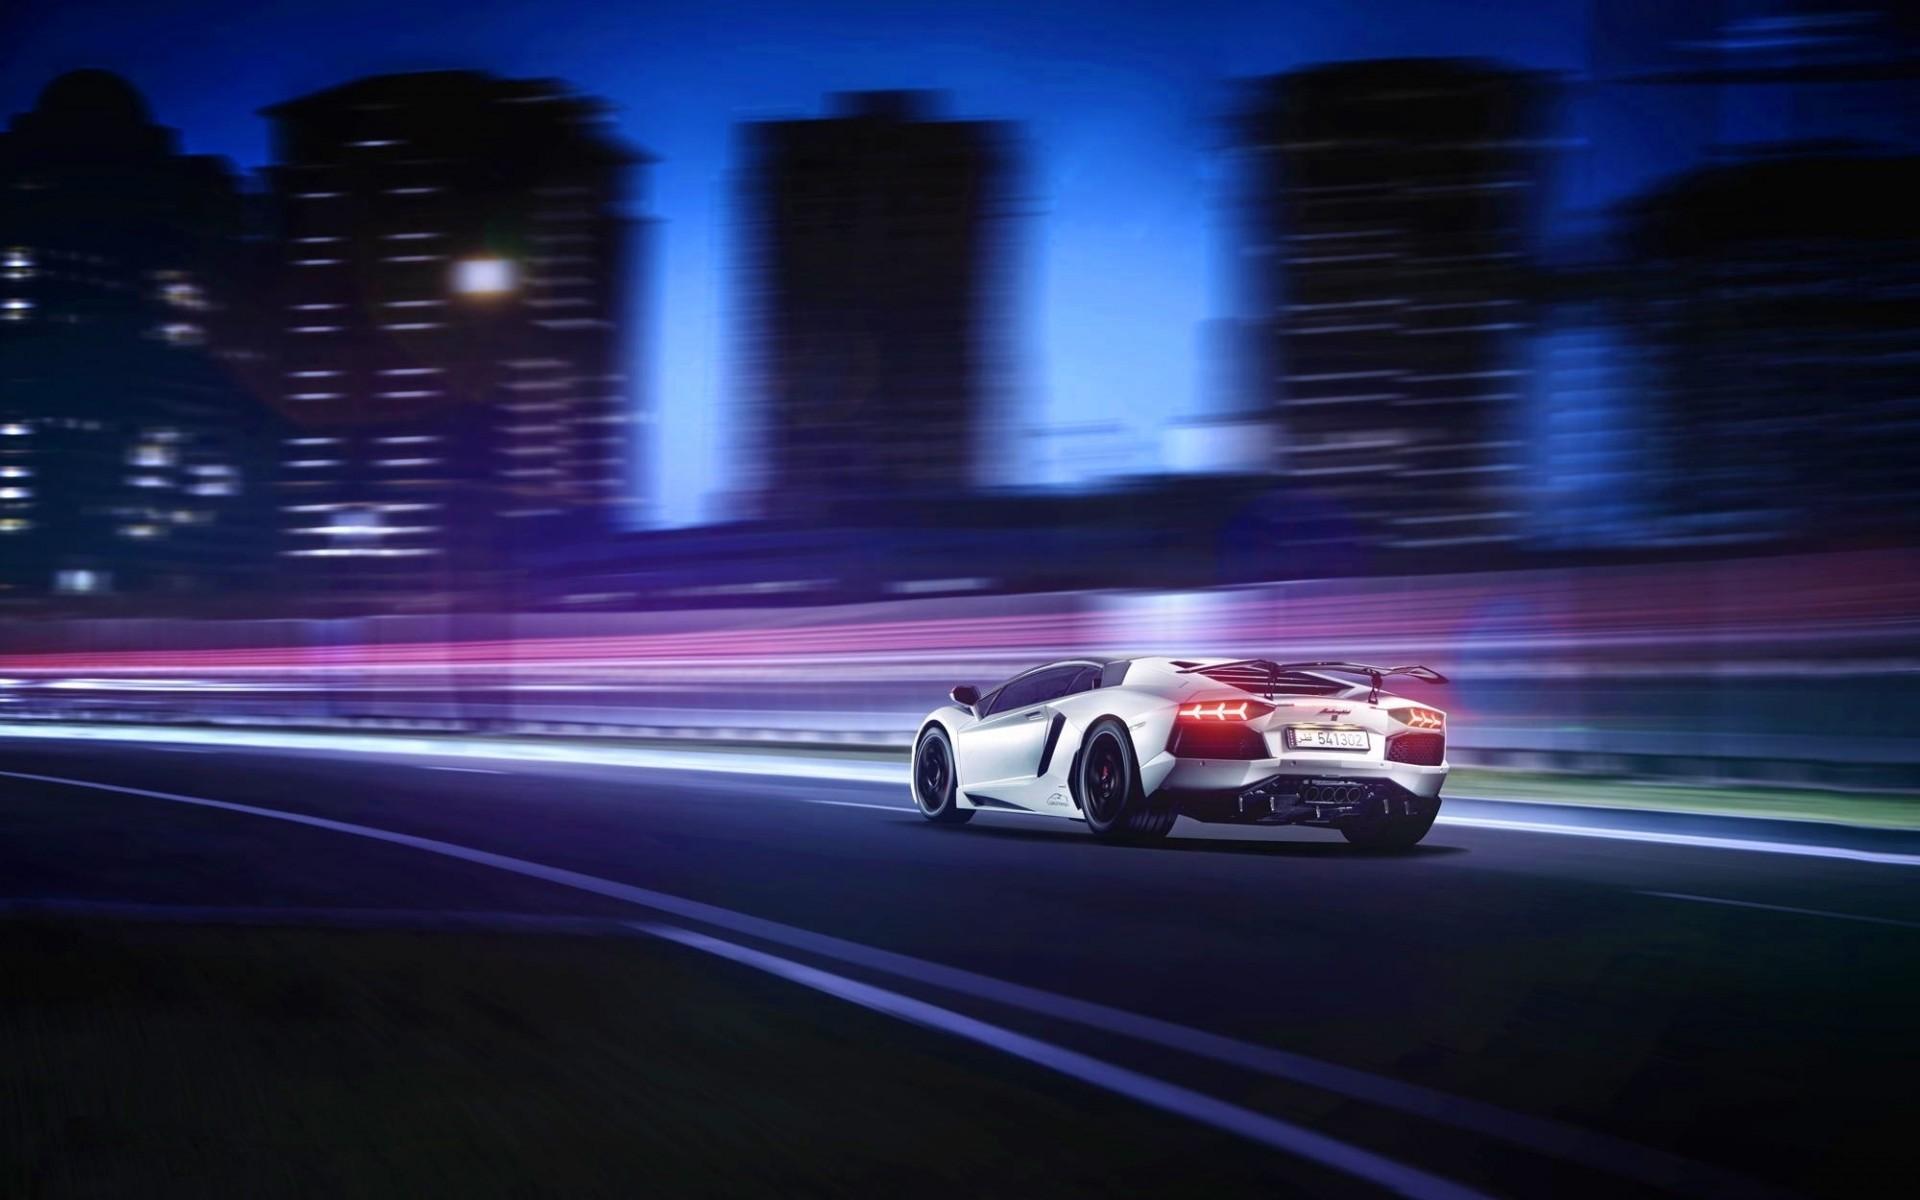 Lamborghini Aventador Motion Blur Hd Cars 4k Wallpapers Images